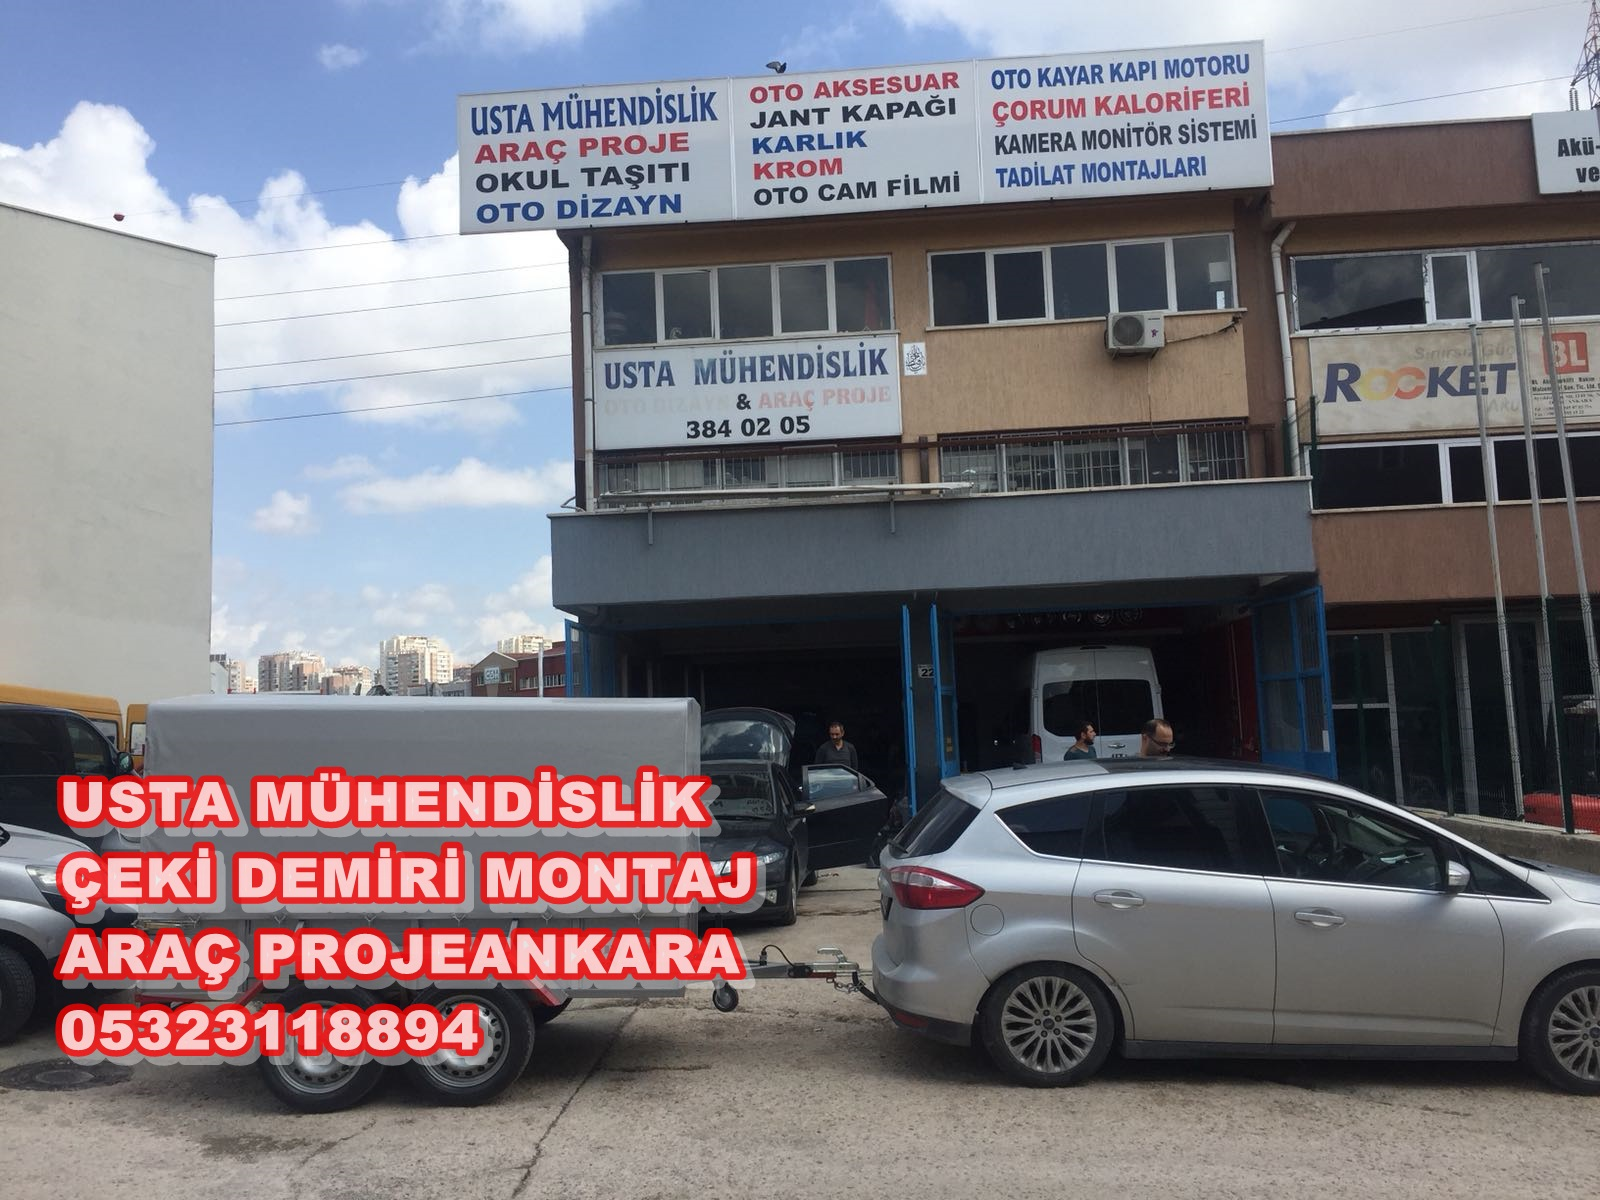 OTO ÇEKİ DEMİRİ ARAÇ PROJE +MONTAJI ANKARA